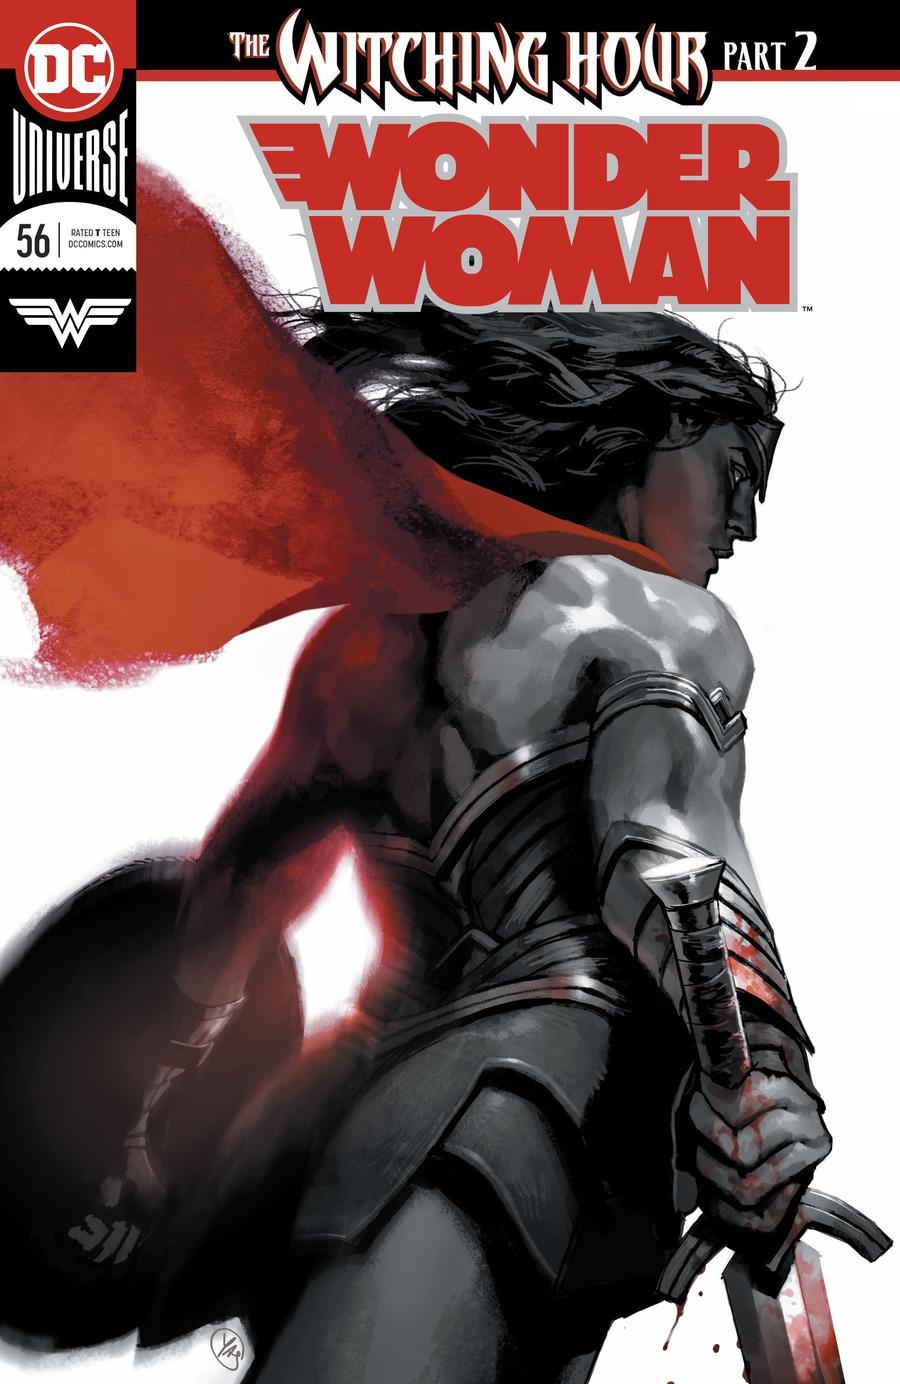 Wonder Woman Vol 5 #56 Cover A Regular Yasmine Putri Enhanced Foil Cover (Witching Hour Part 2)